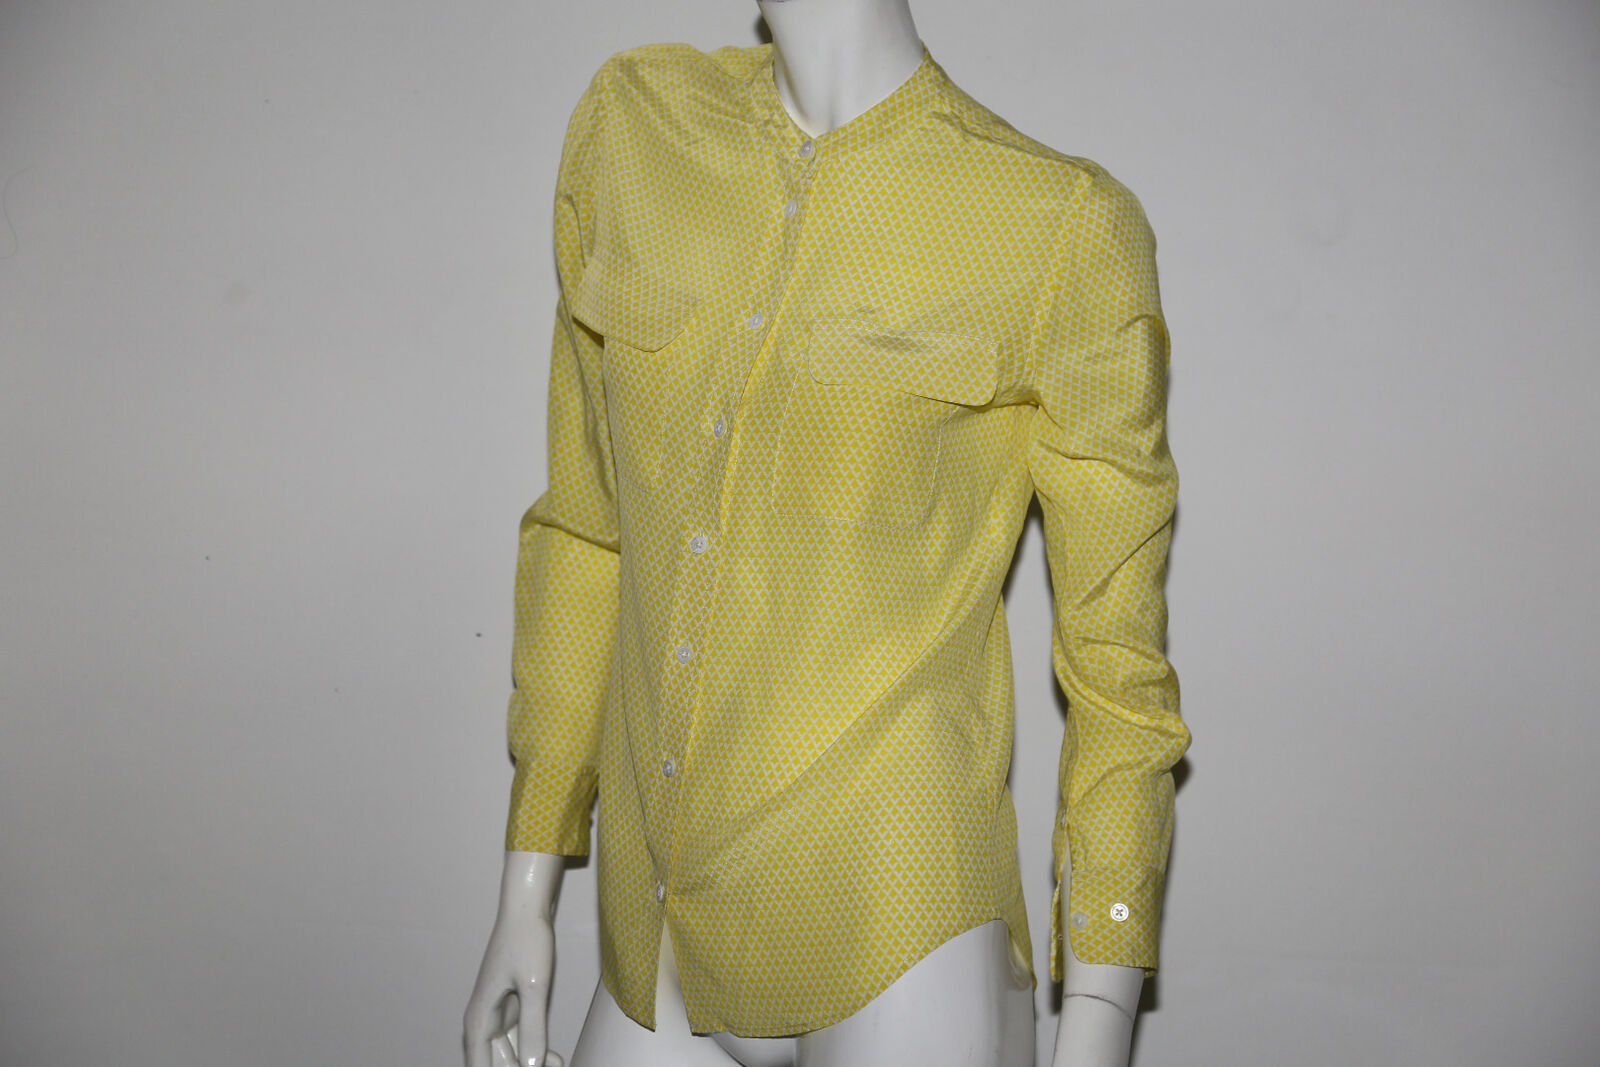 EQUIPMENT FEMME Gelb Silk Button Down Shirt Blouse Größe S